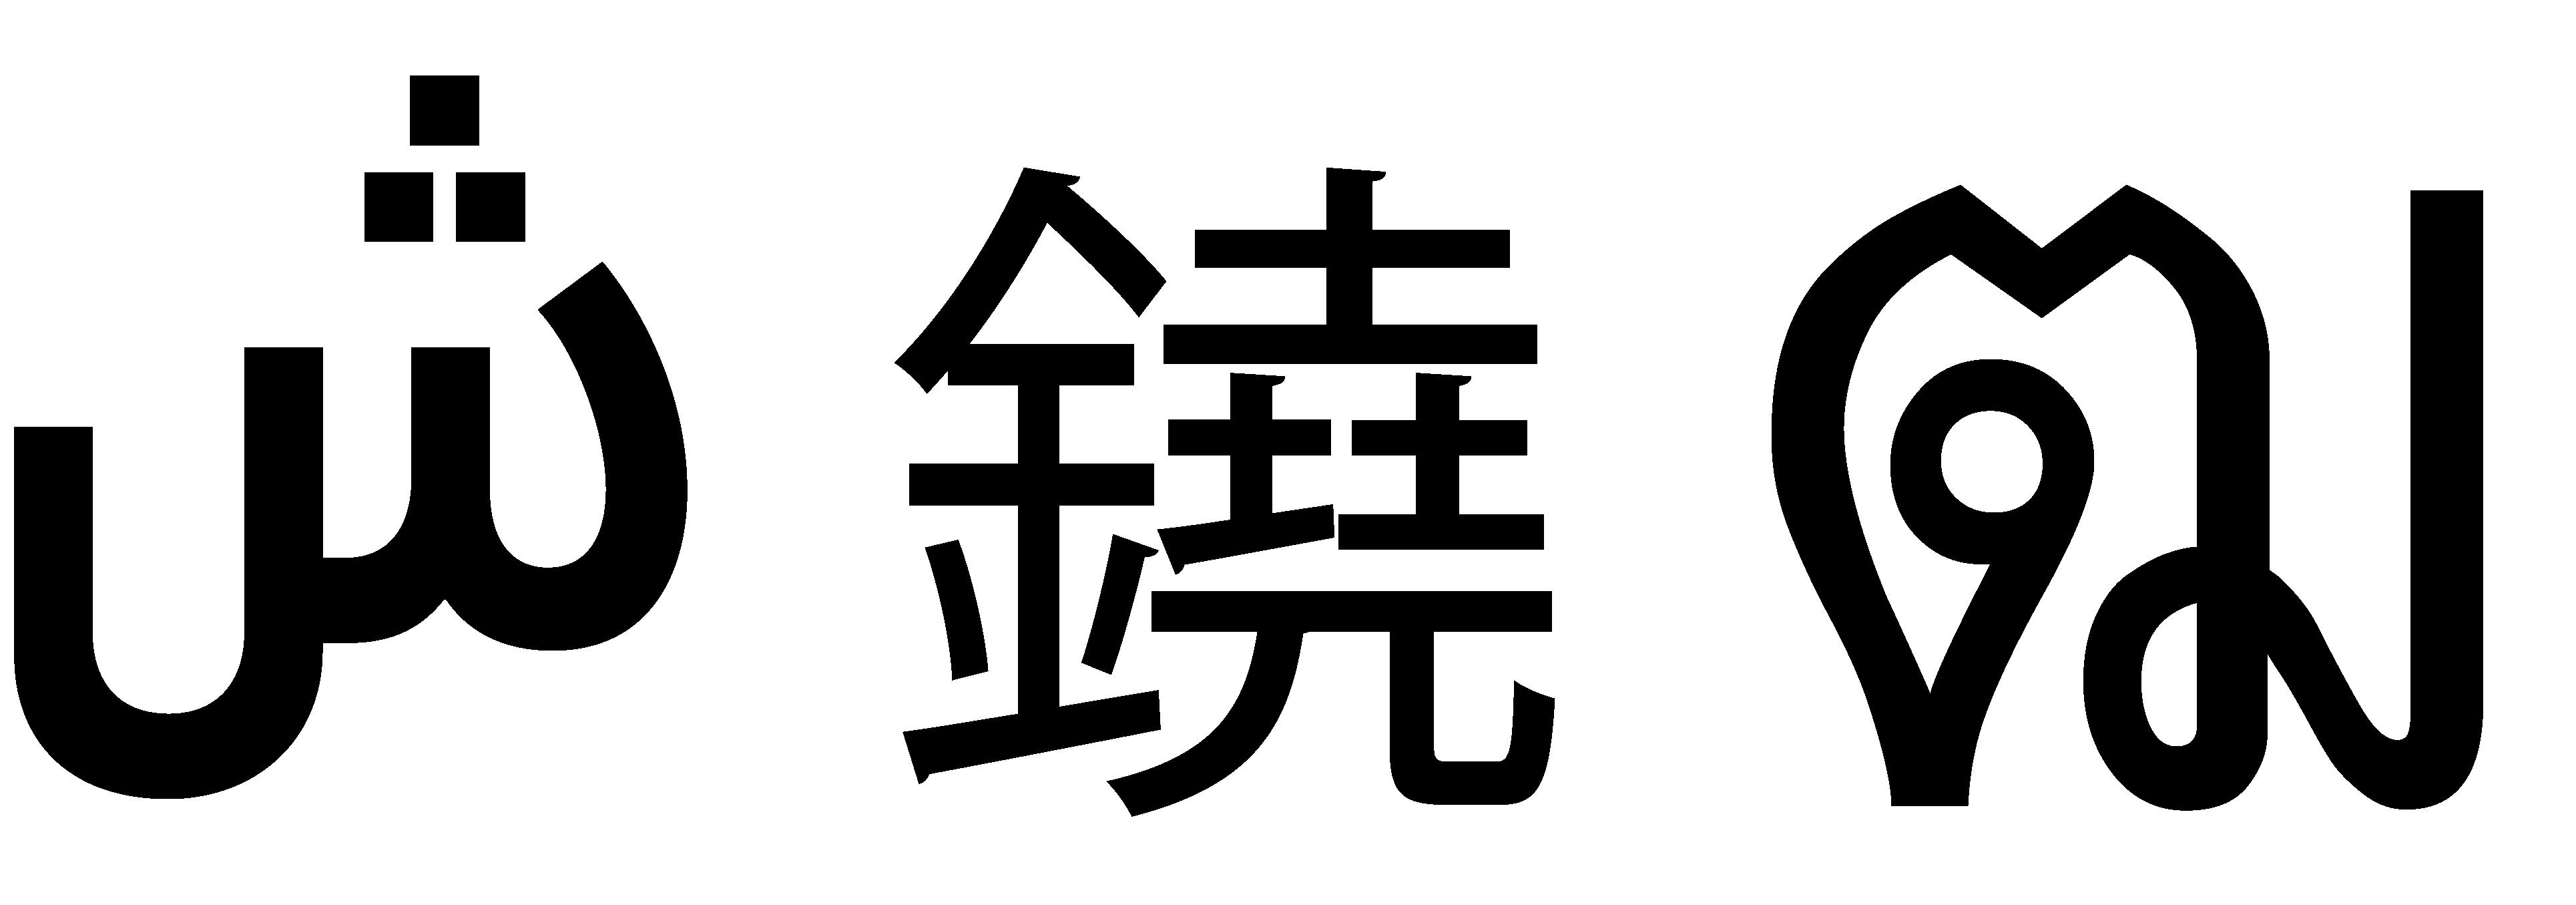 Lipton Ice Tea CJK branding typography